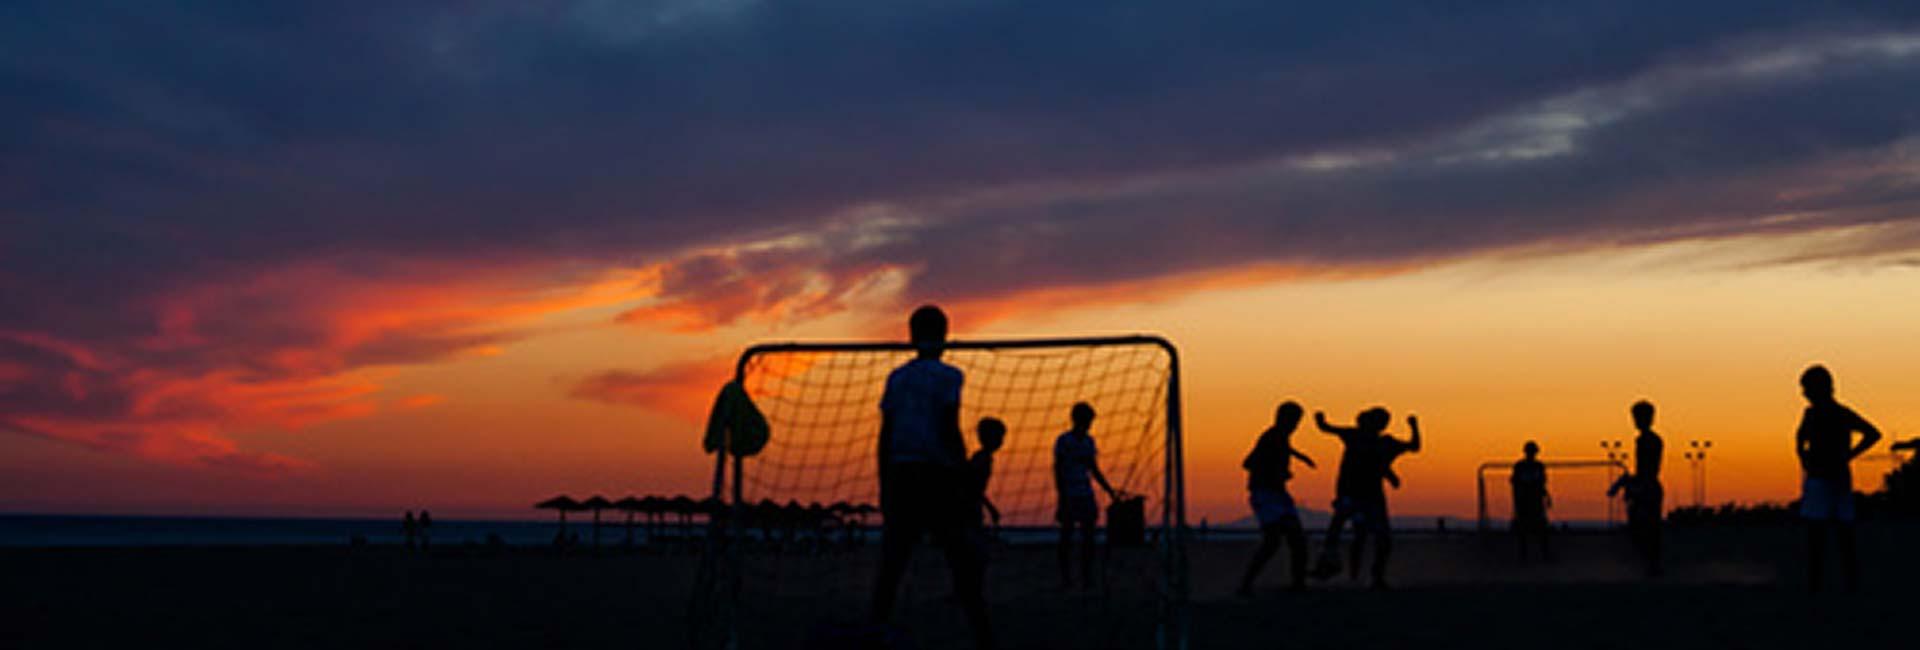 foto-futbol-at-night